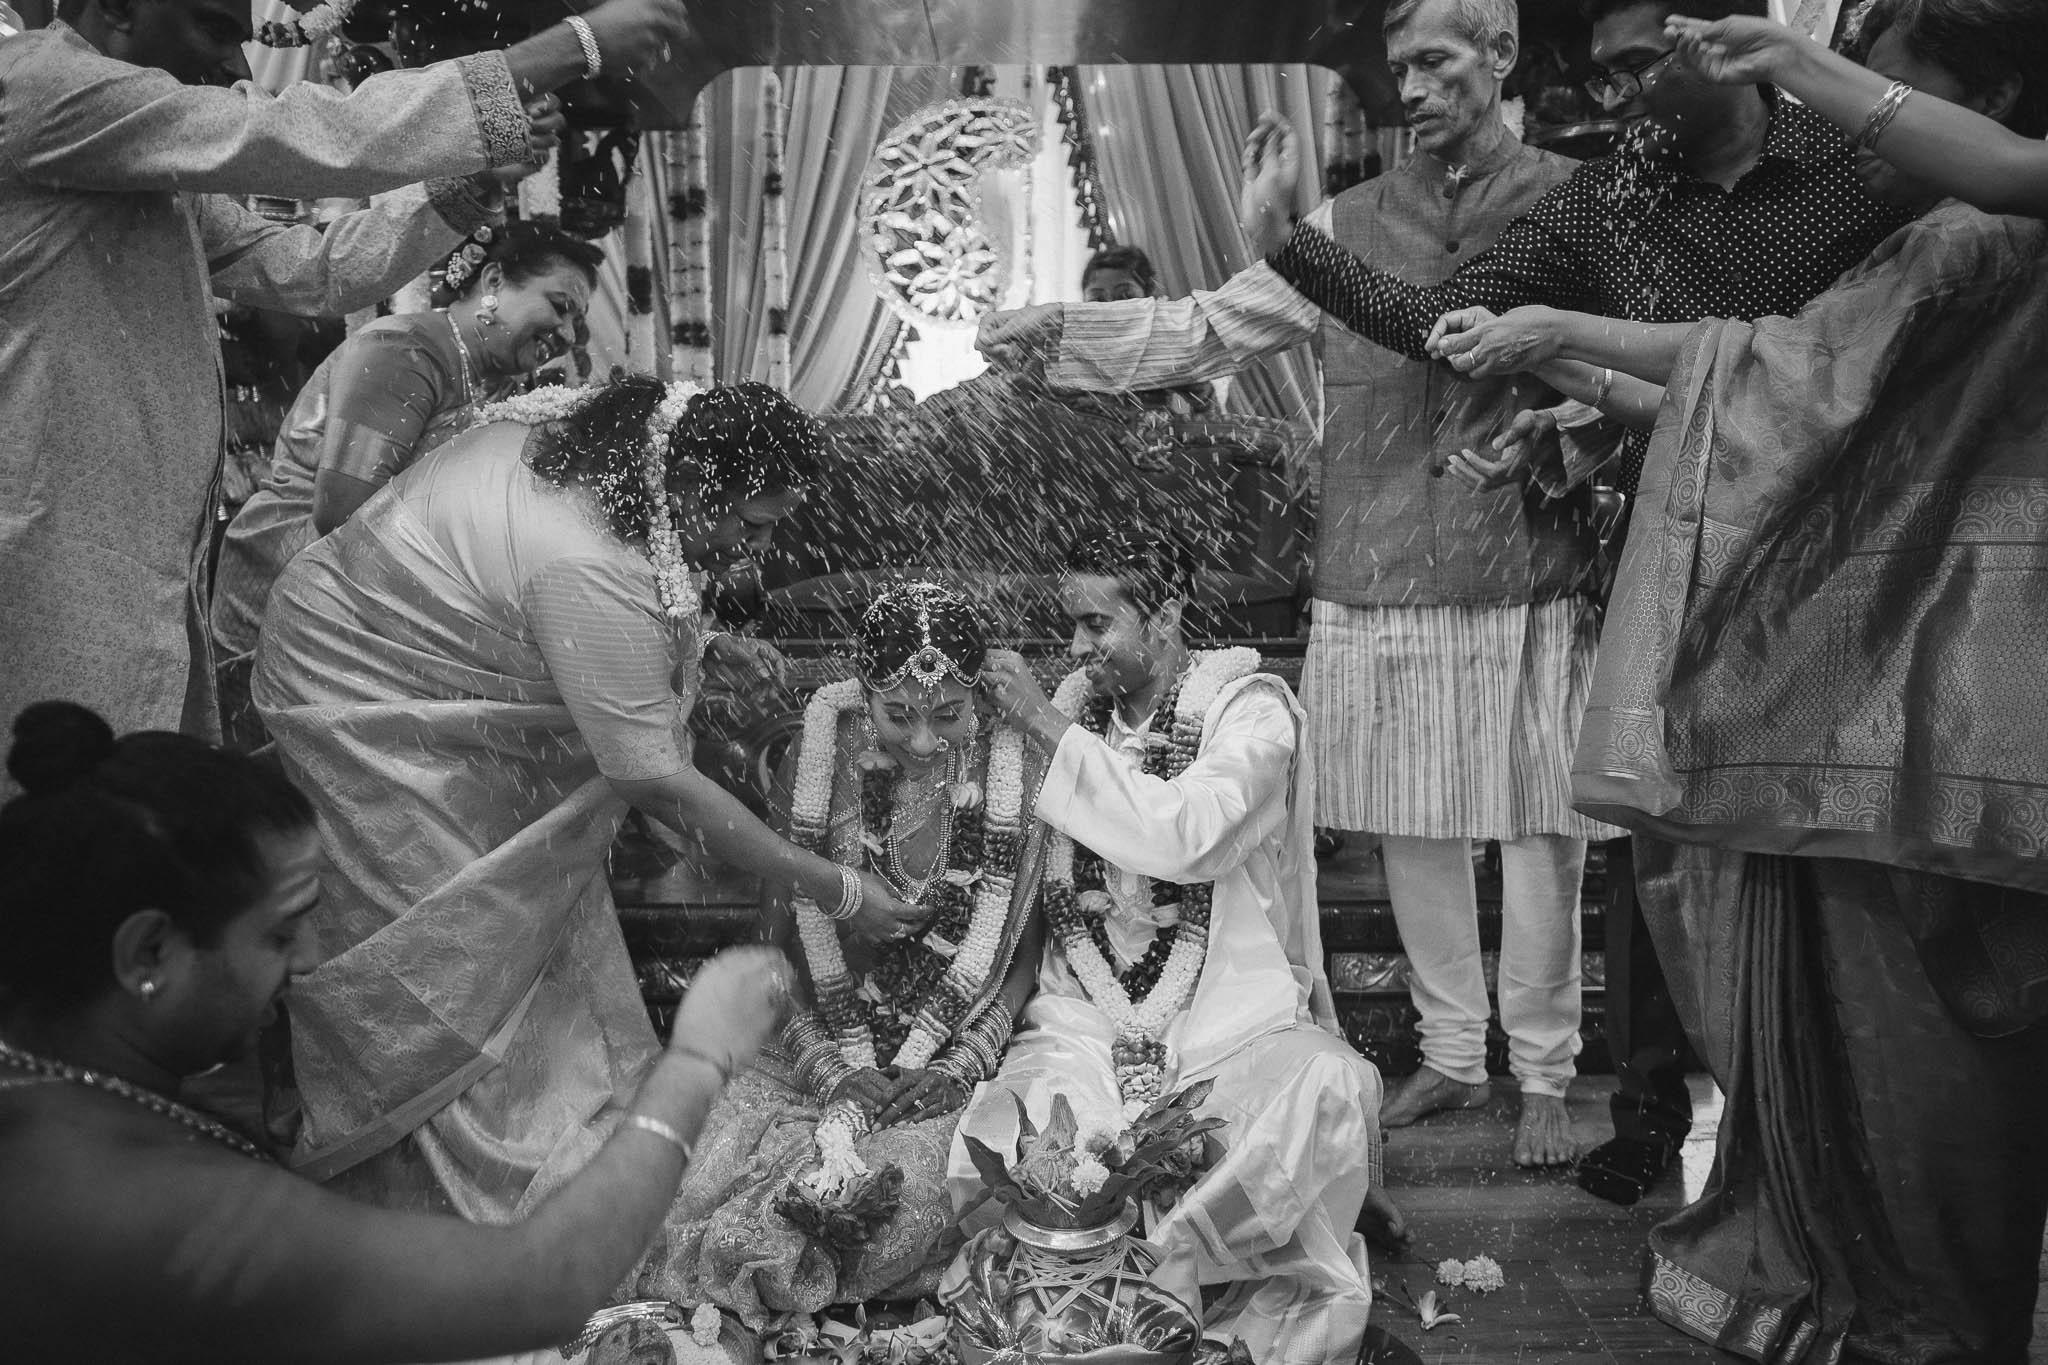 singapore-wedding-photographer-malay-indian-pre-wedding-travel-wmt-2015-64.jpg